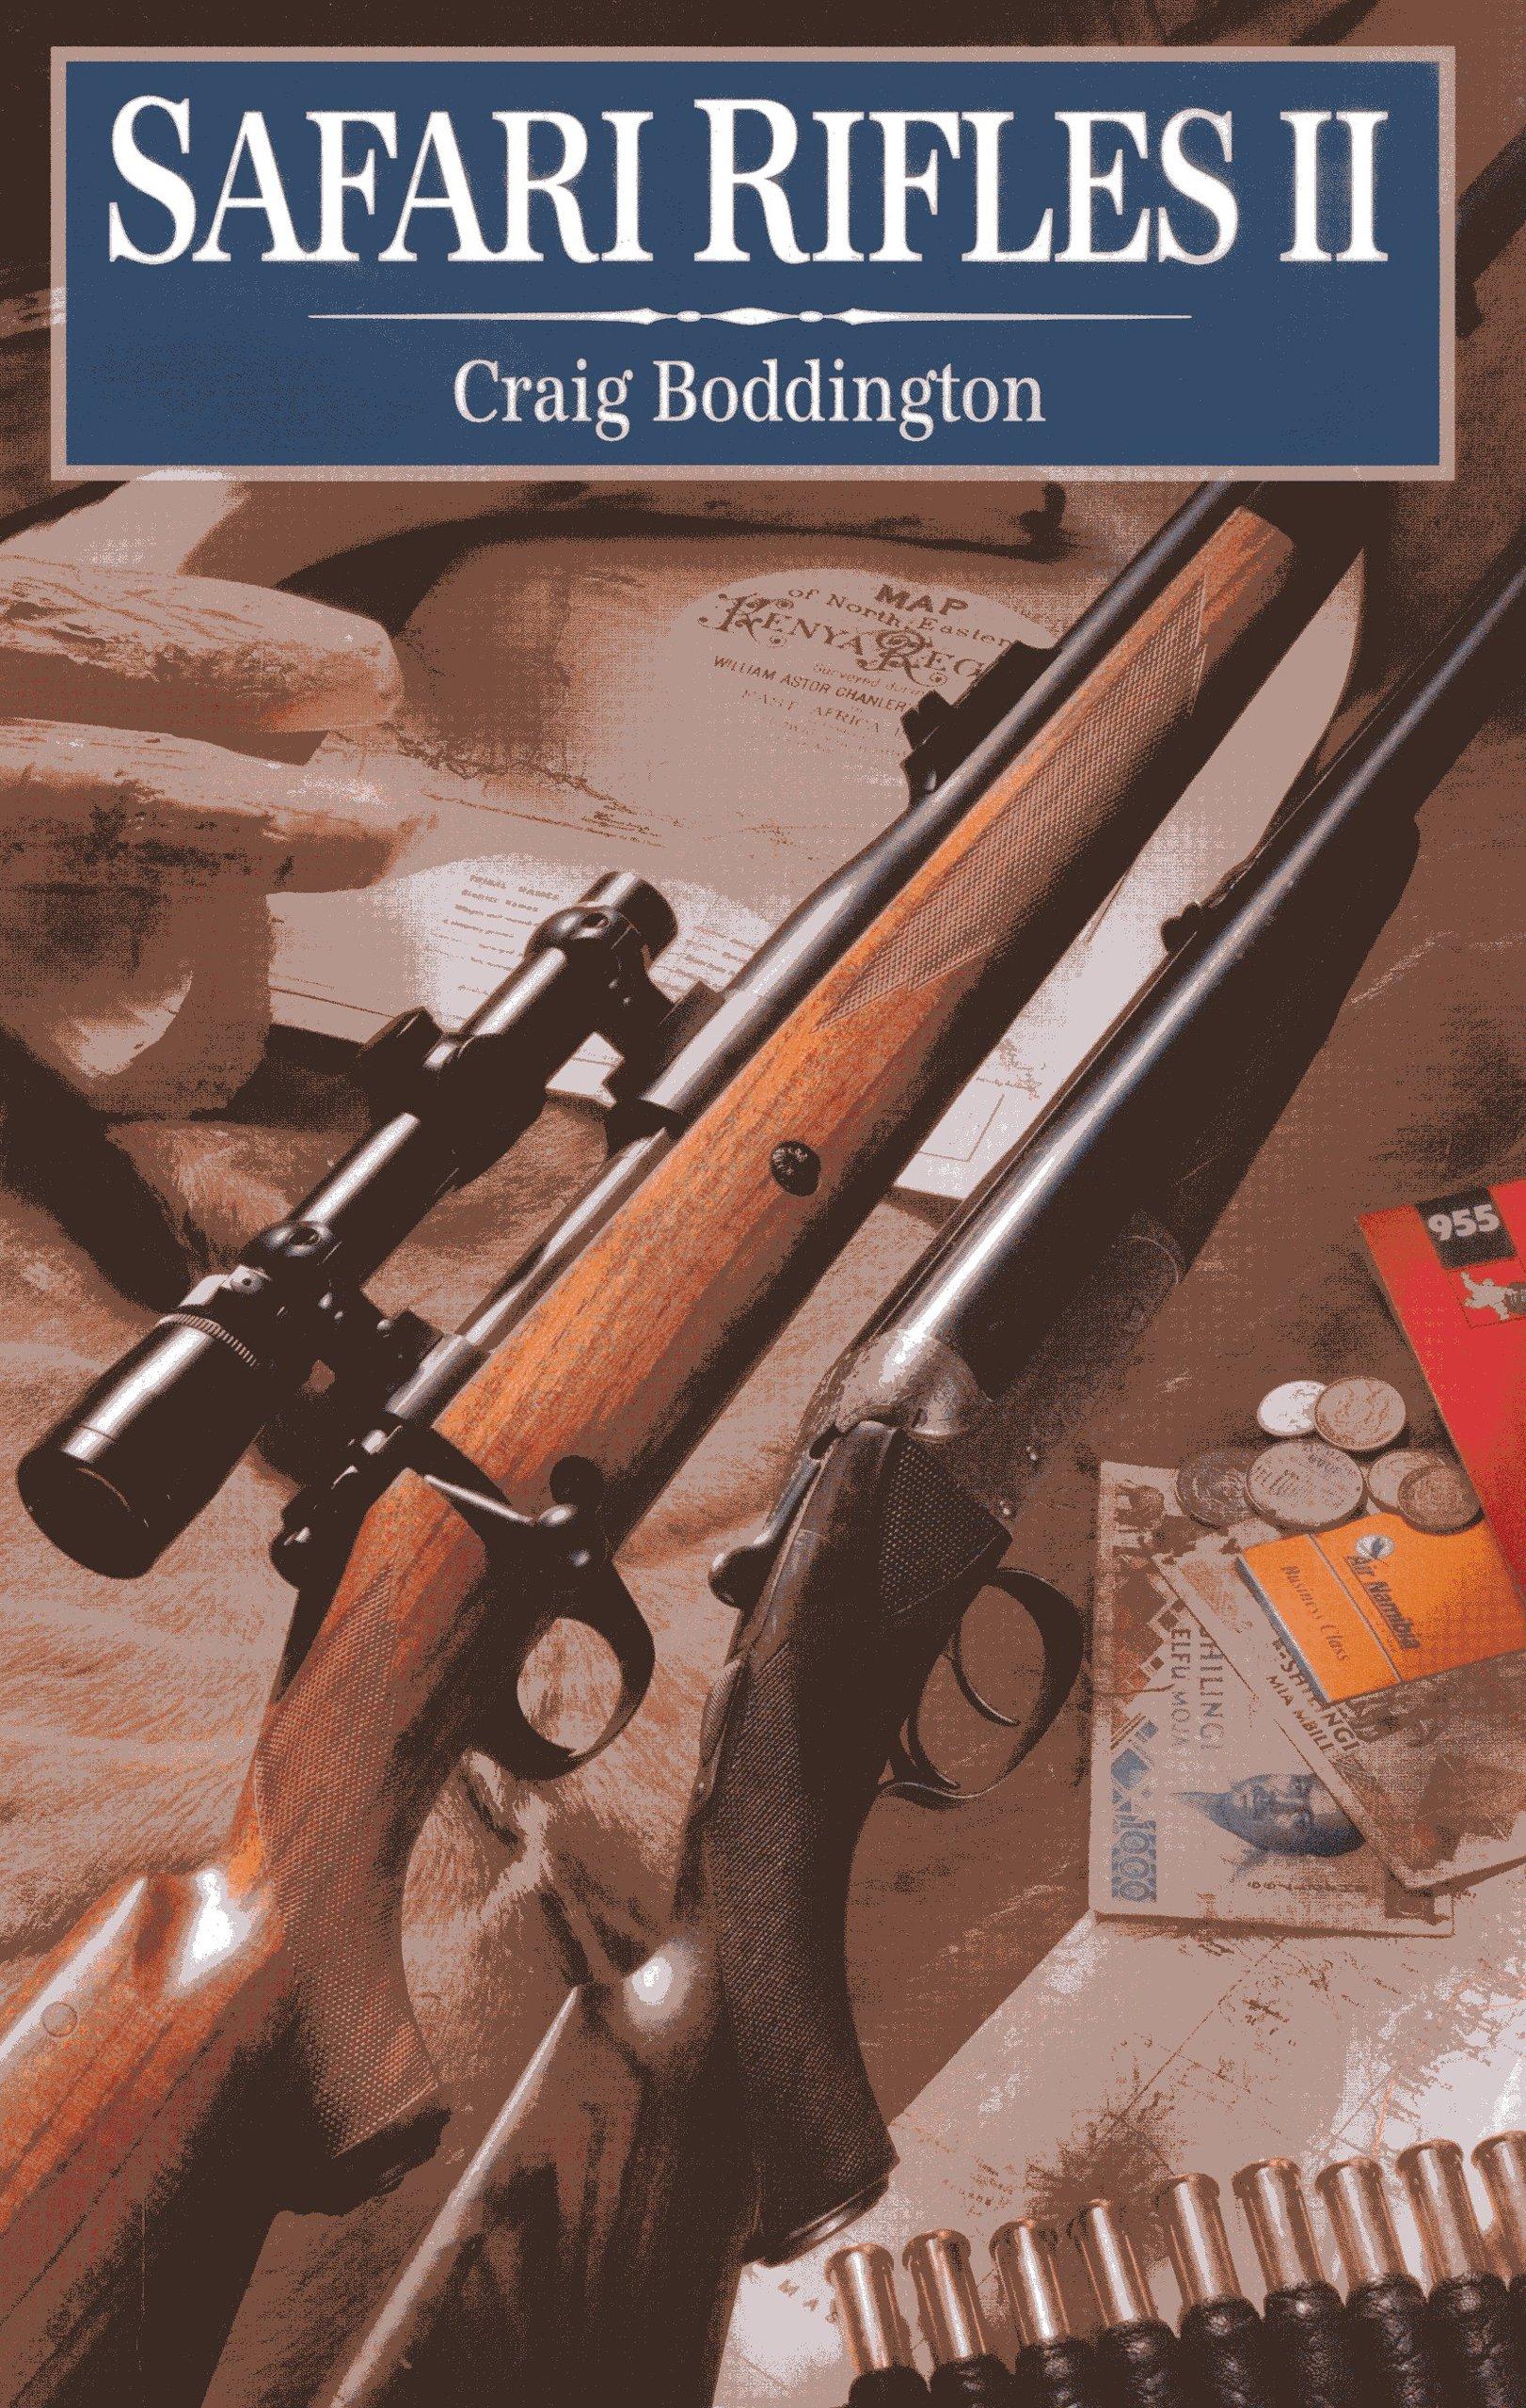 Safari Rifles II Doubles Magazine And Cartridges For African Hunting Craig Boddington 9781571573292 Amazon Books